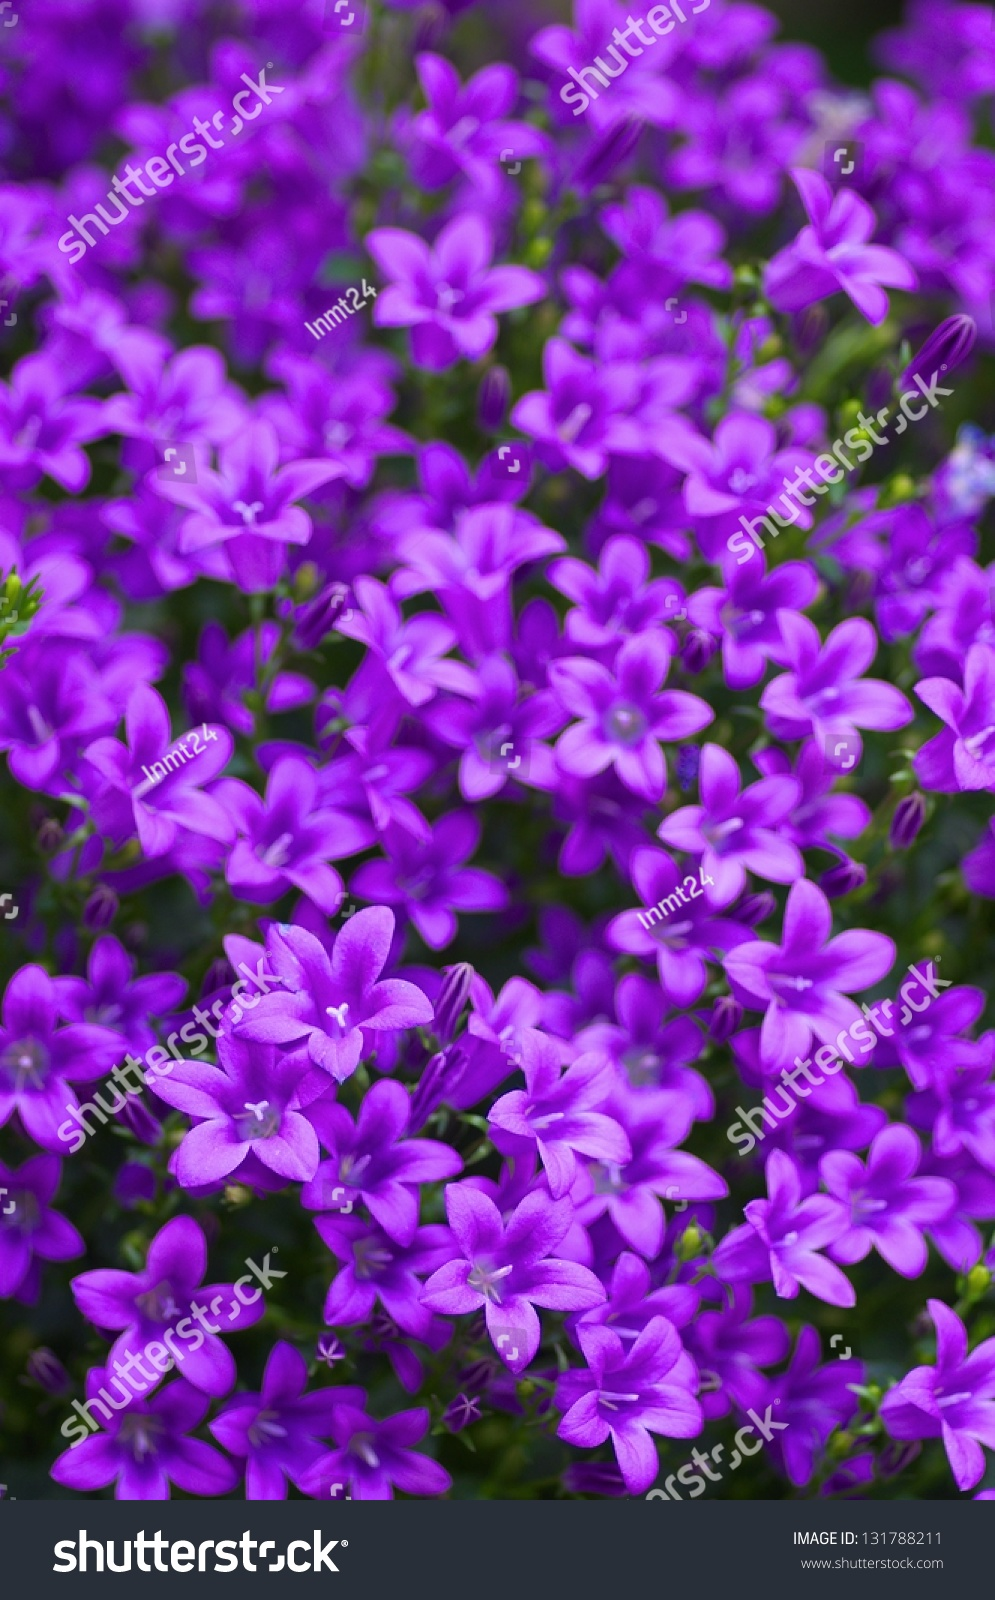 small purple flowers stock photo   shutterstock, Beautiful flower